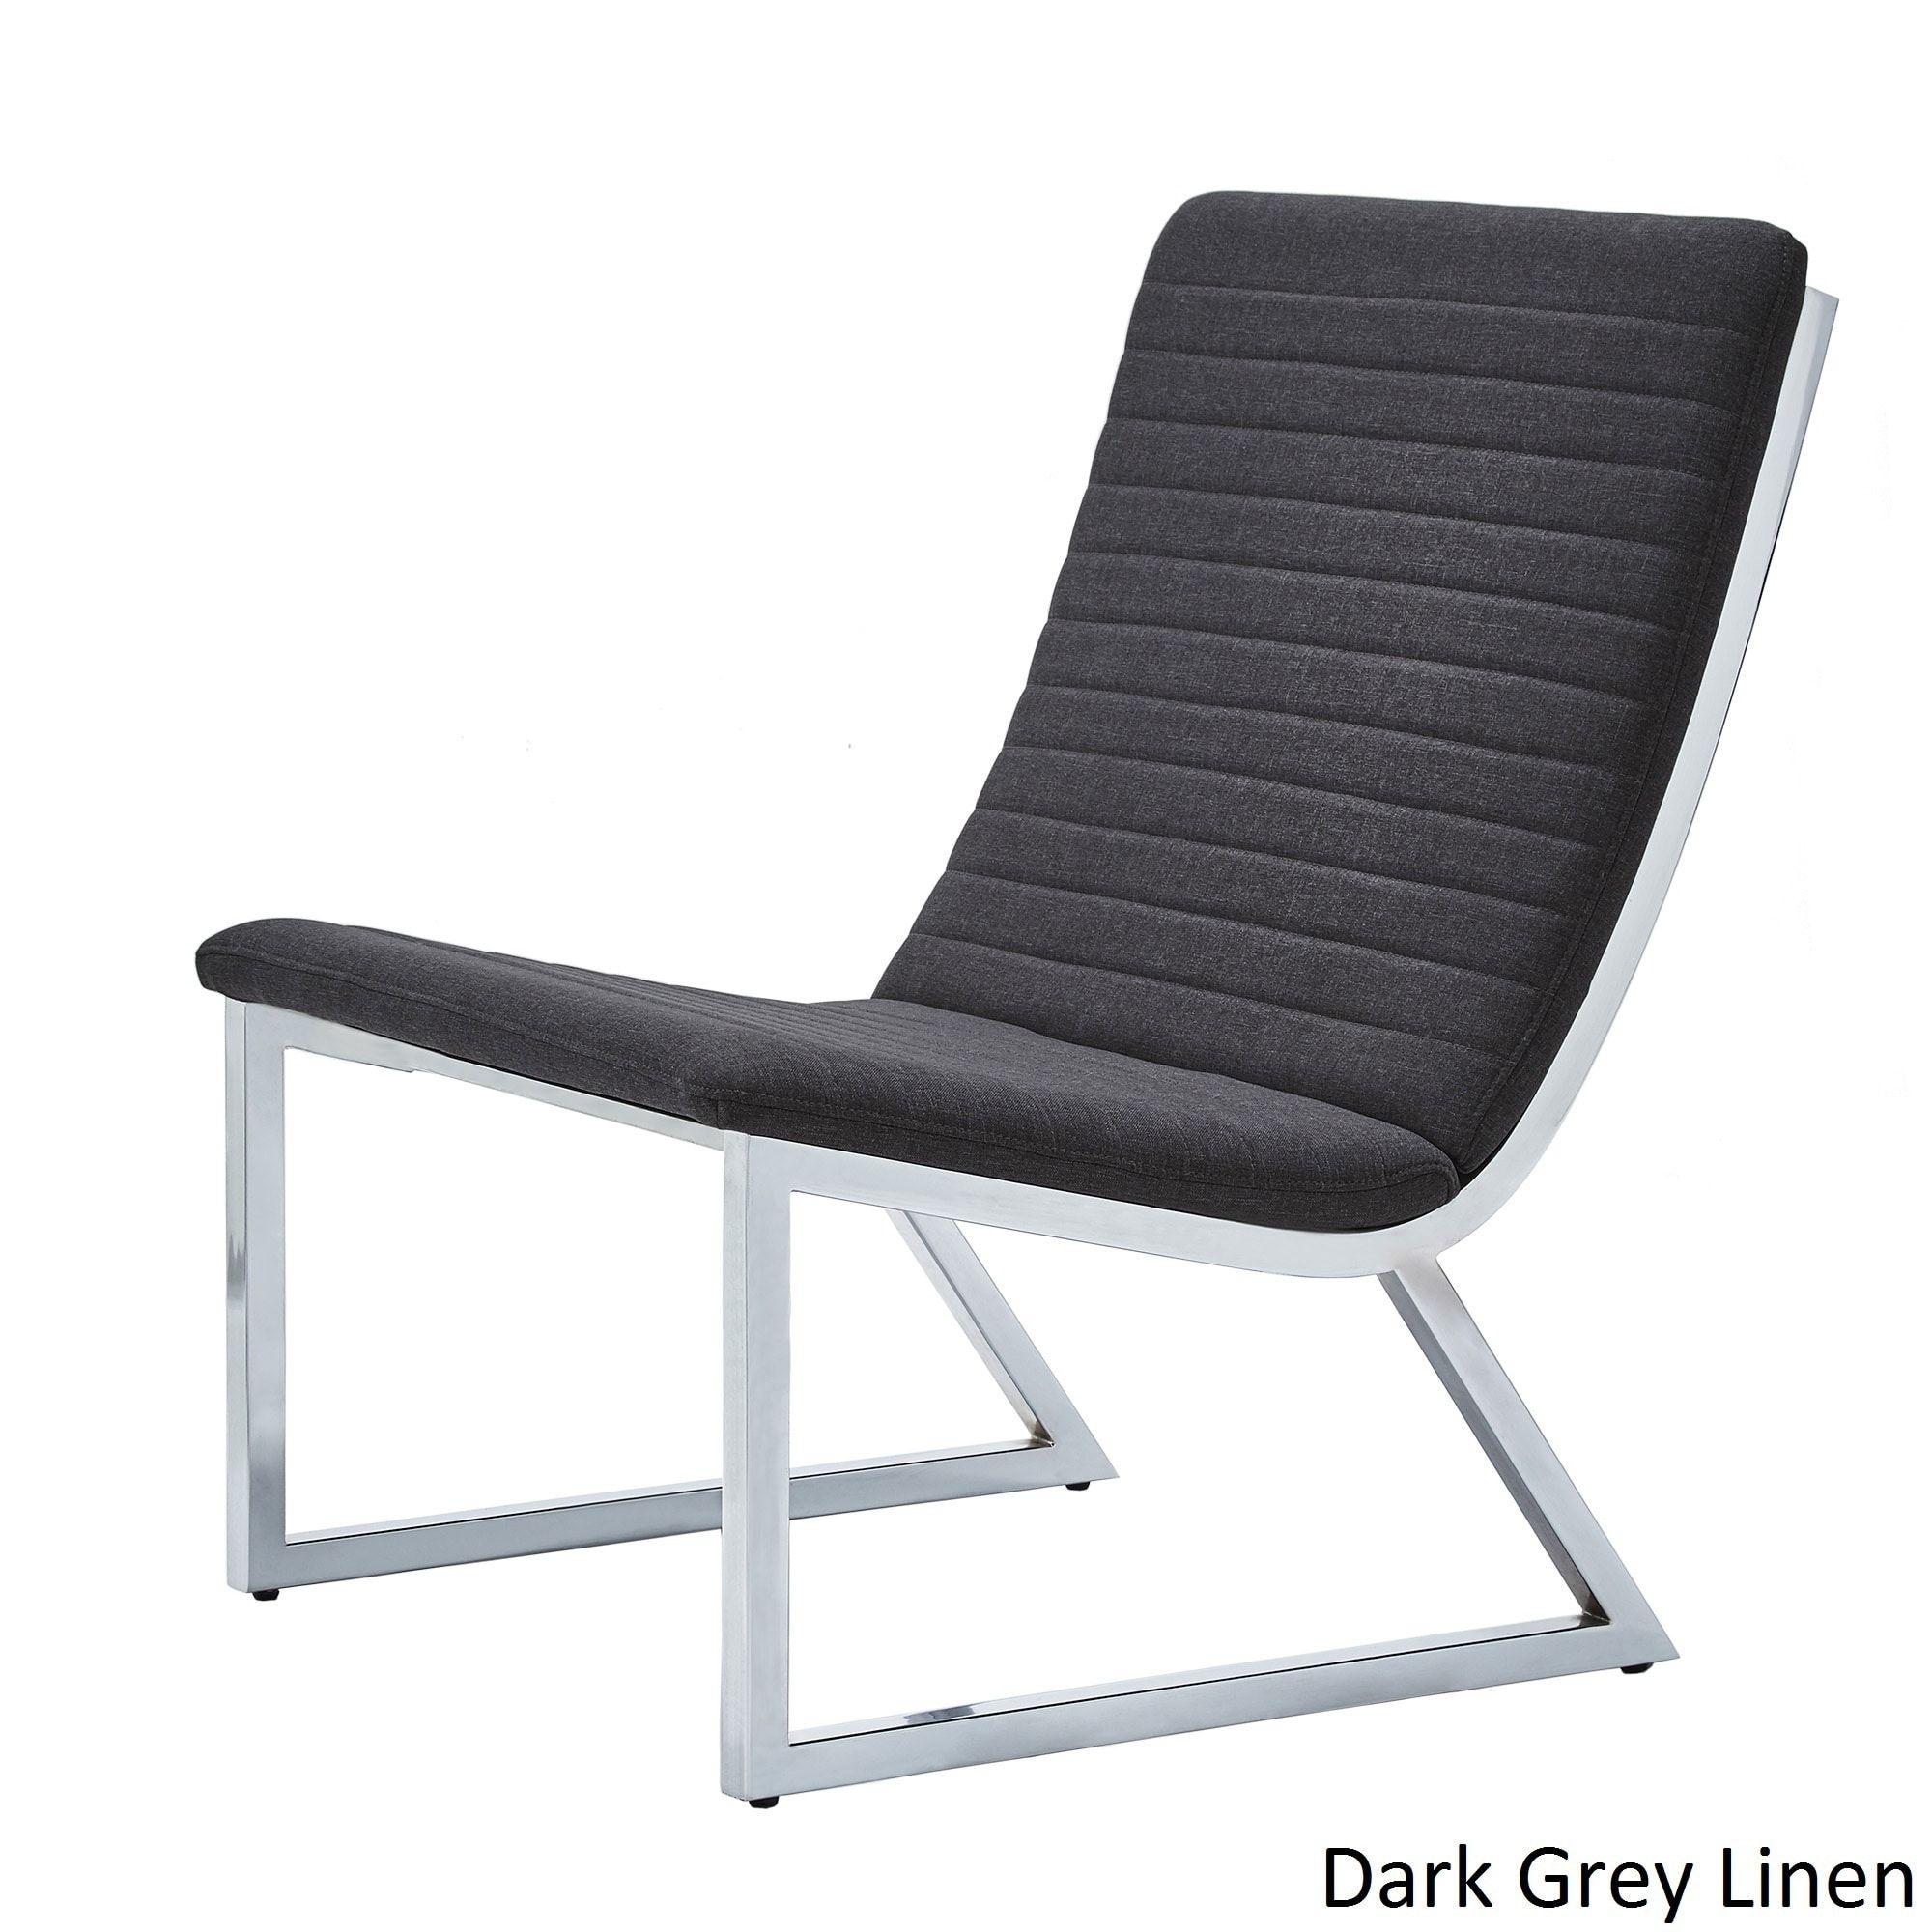 Stupendous Ululani Grey Linen Chrome Metal Leg Accent Chair Inspire Q Cjindustries Chair Design For Home Cjindustriesco